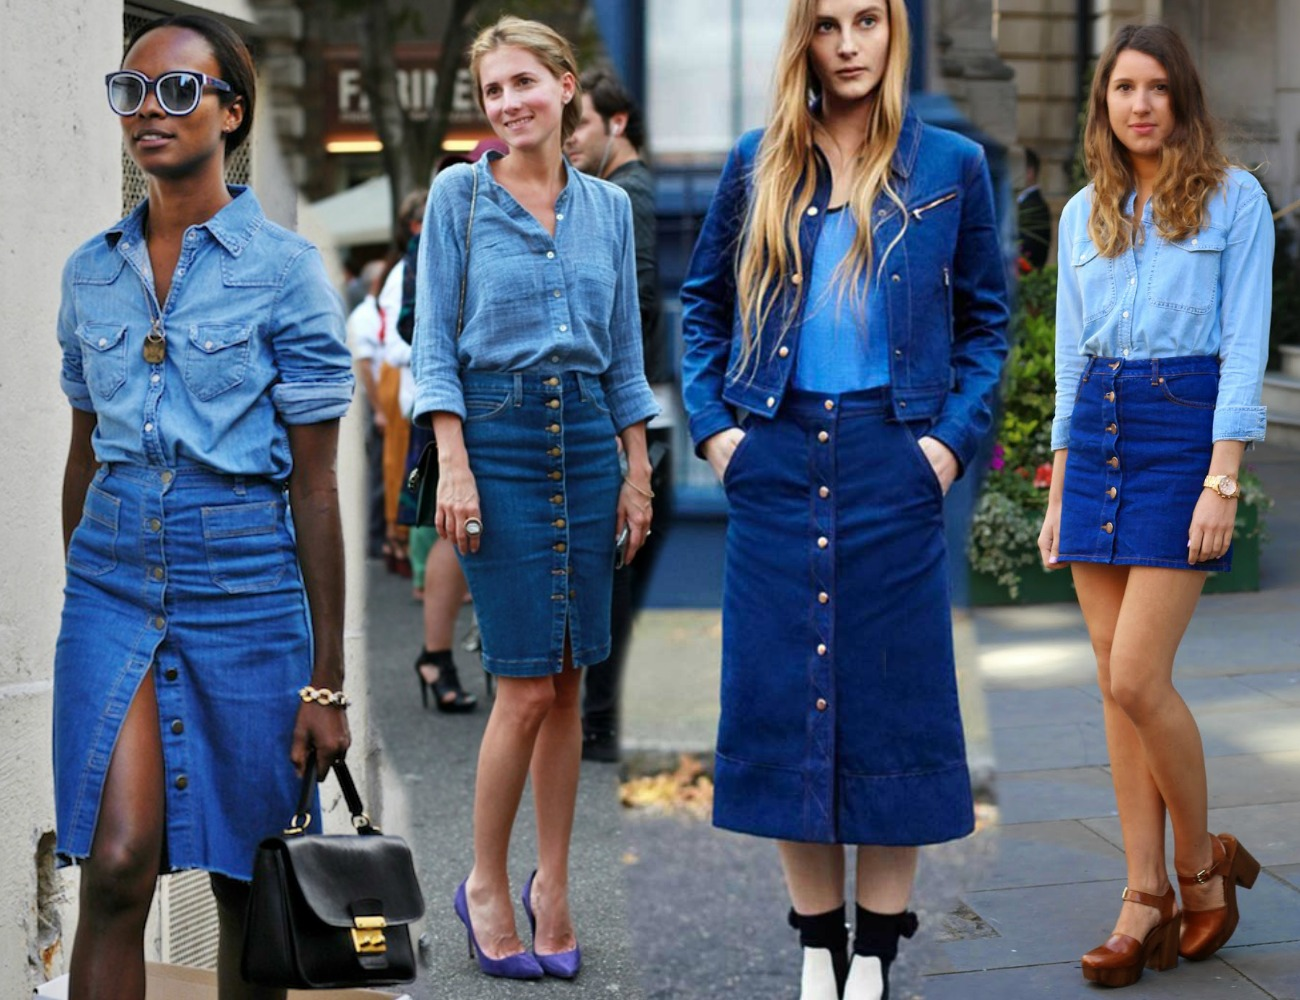 Image source: Pearl Fashion .